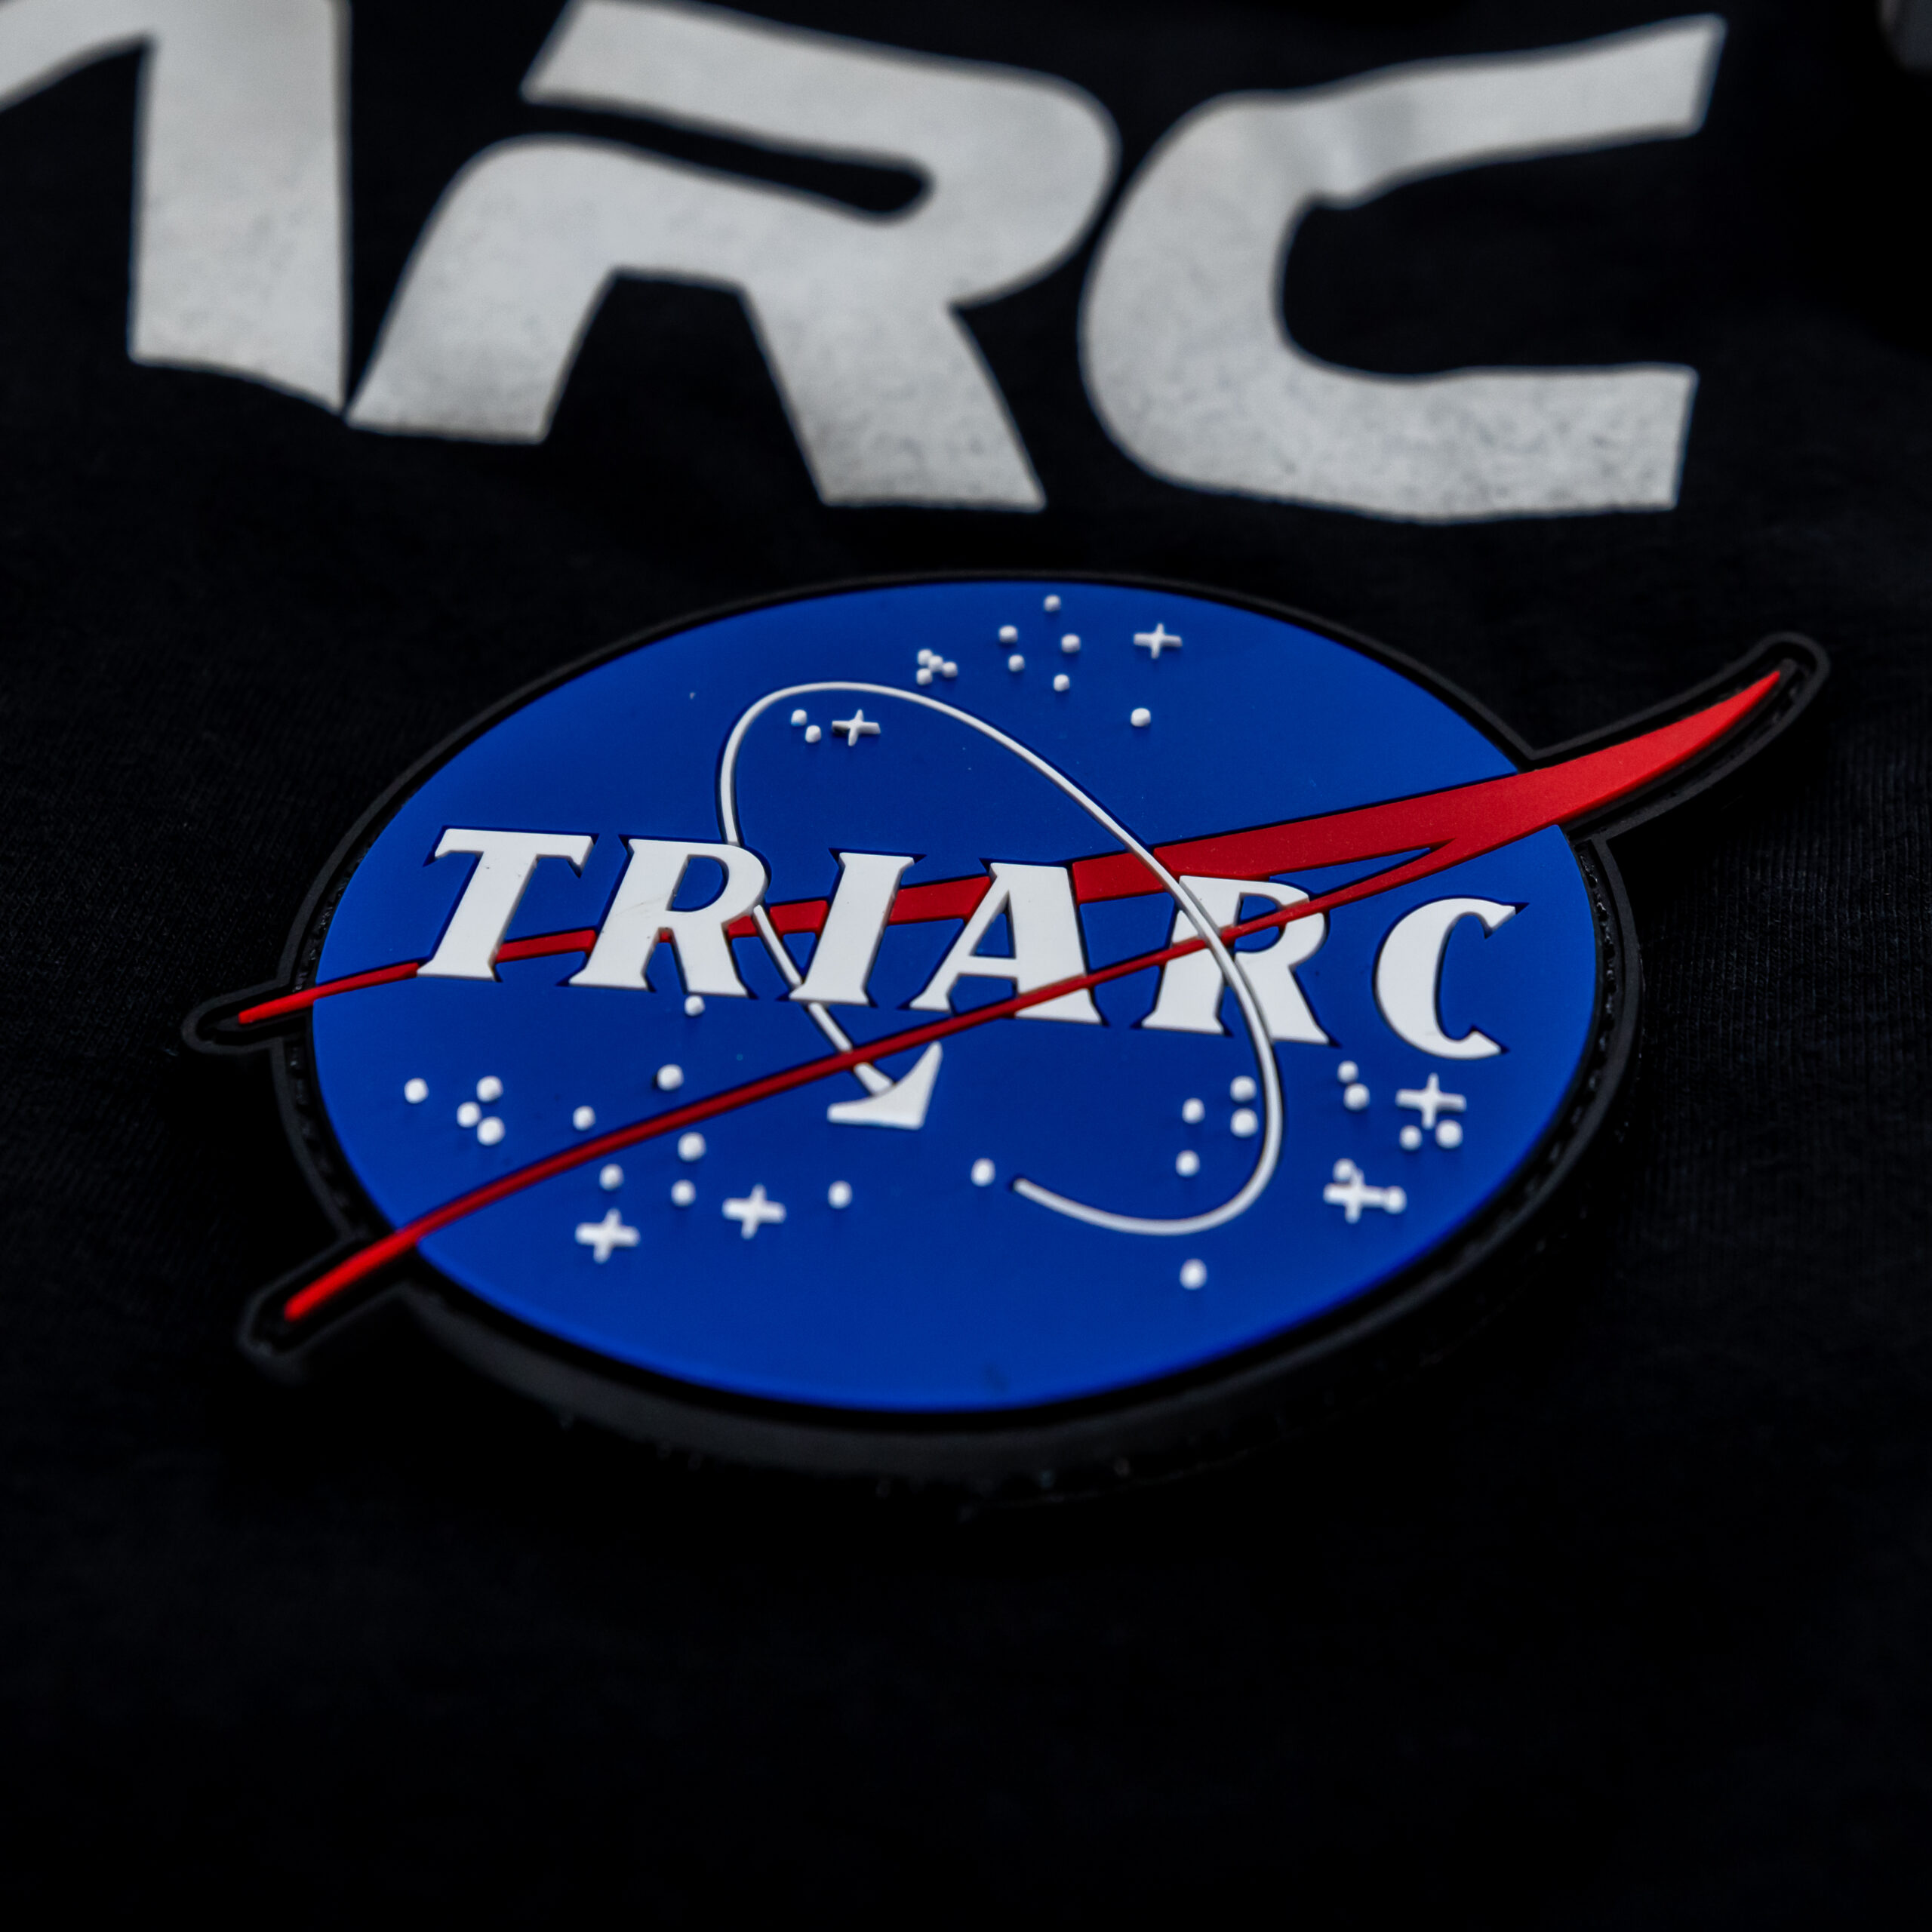 TRIARC Systems Shield PVC Patch